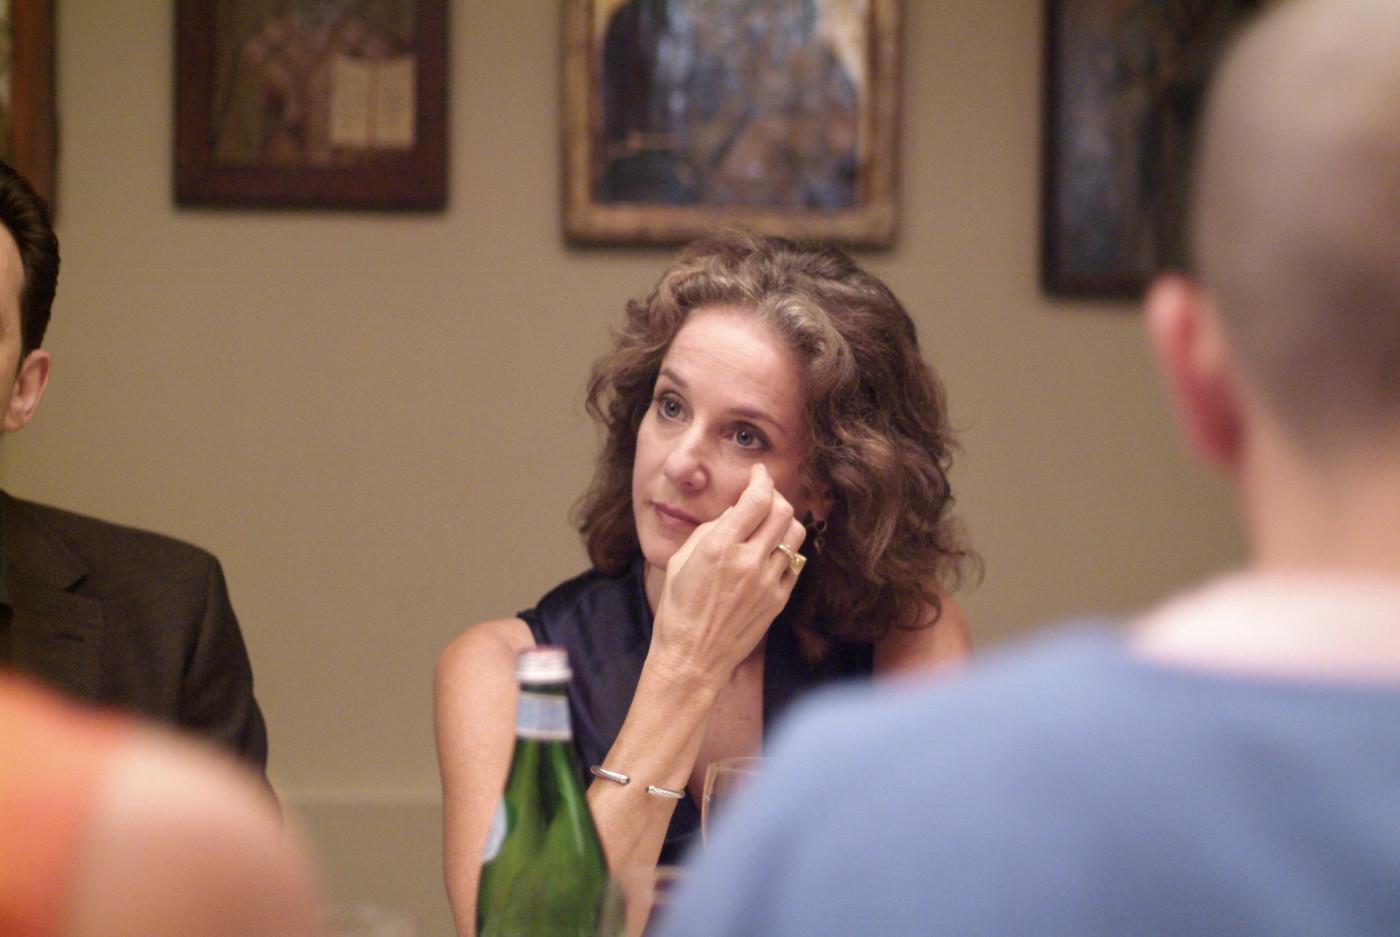 Rachel Getting Married Florin Zamfirescu